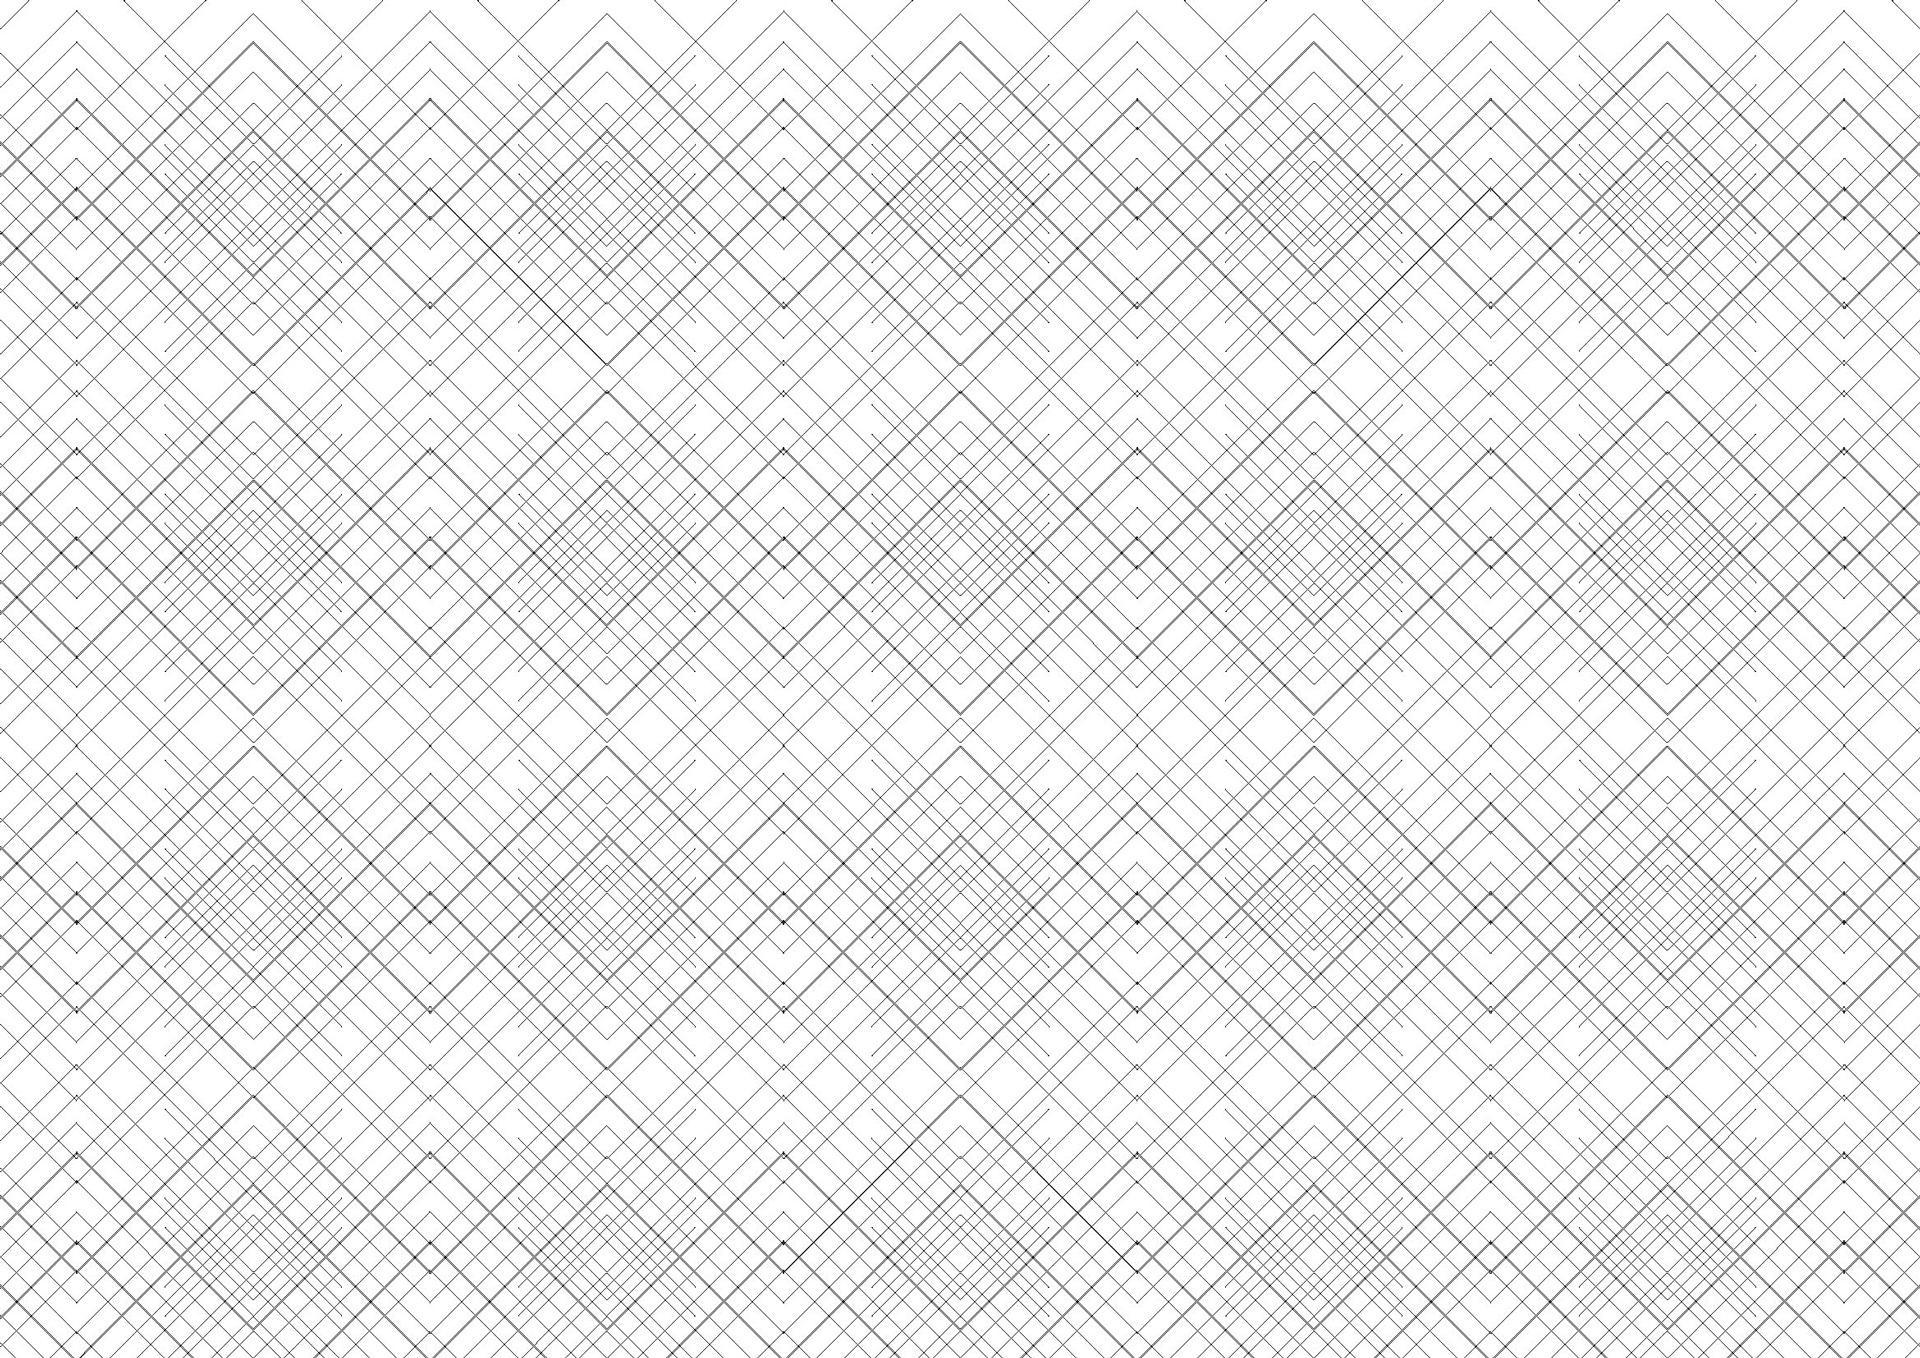 pattern_05